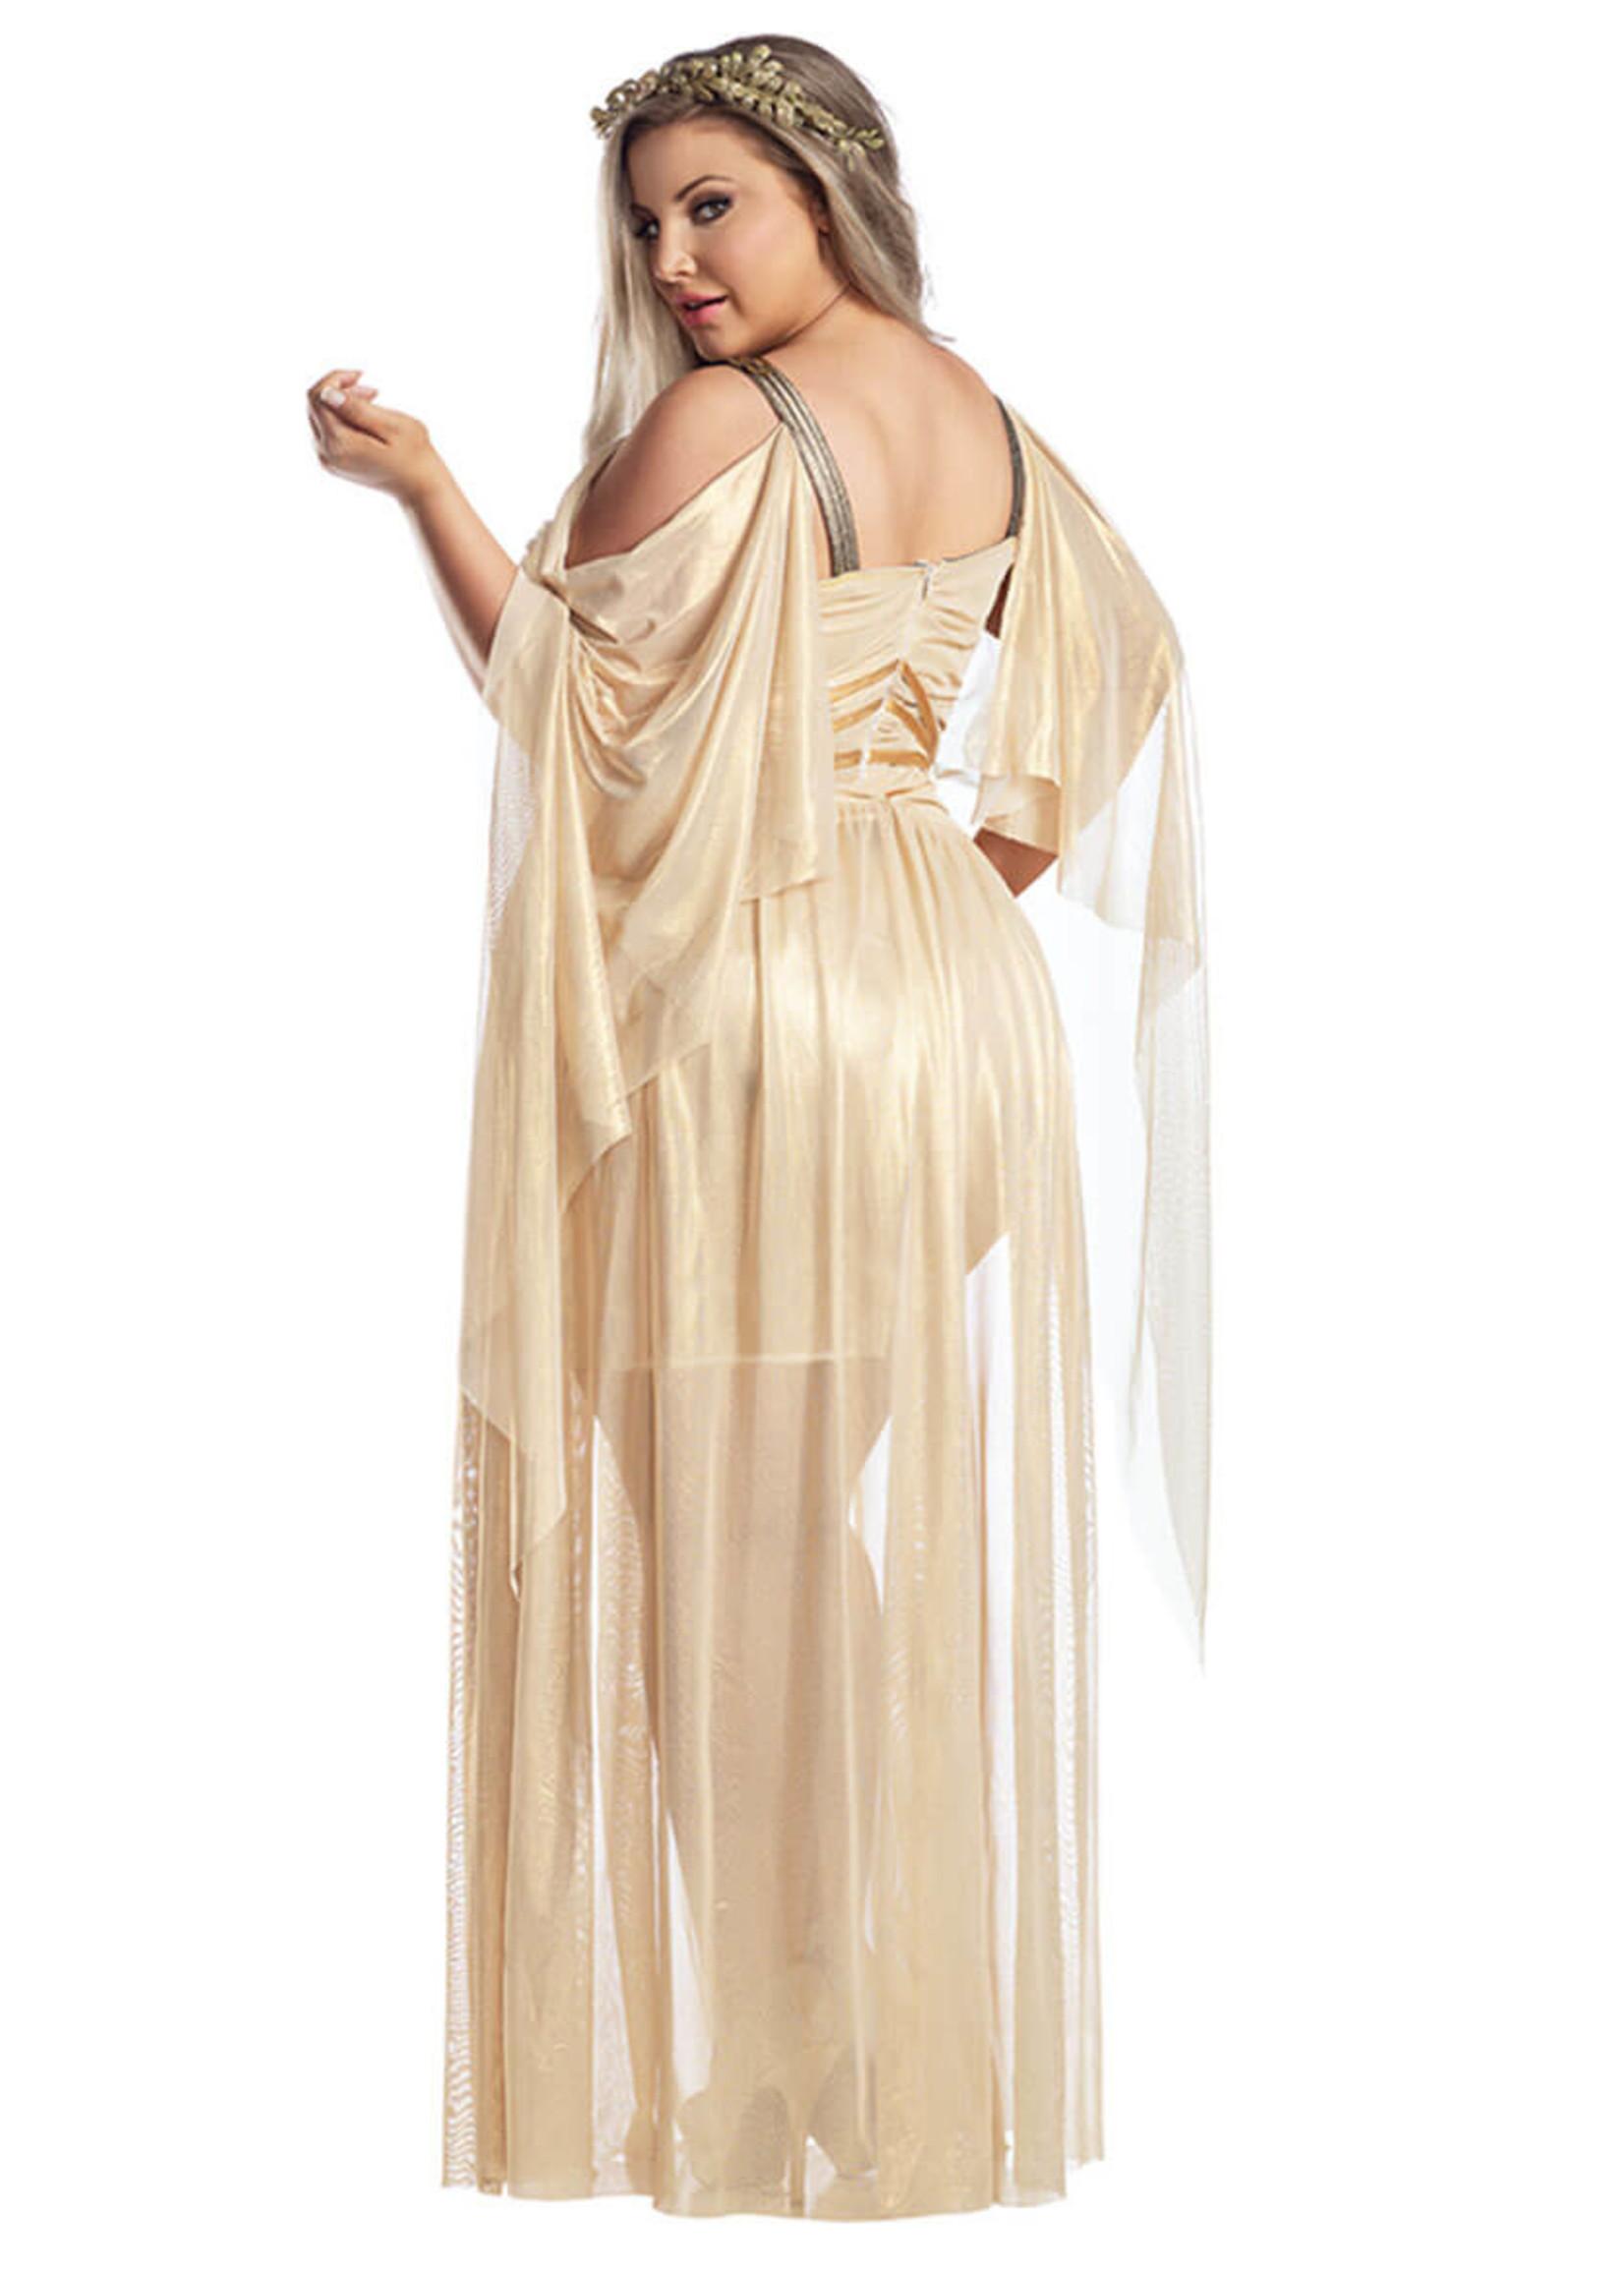 starline Gilded Goddess-Plus